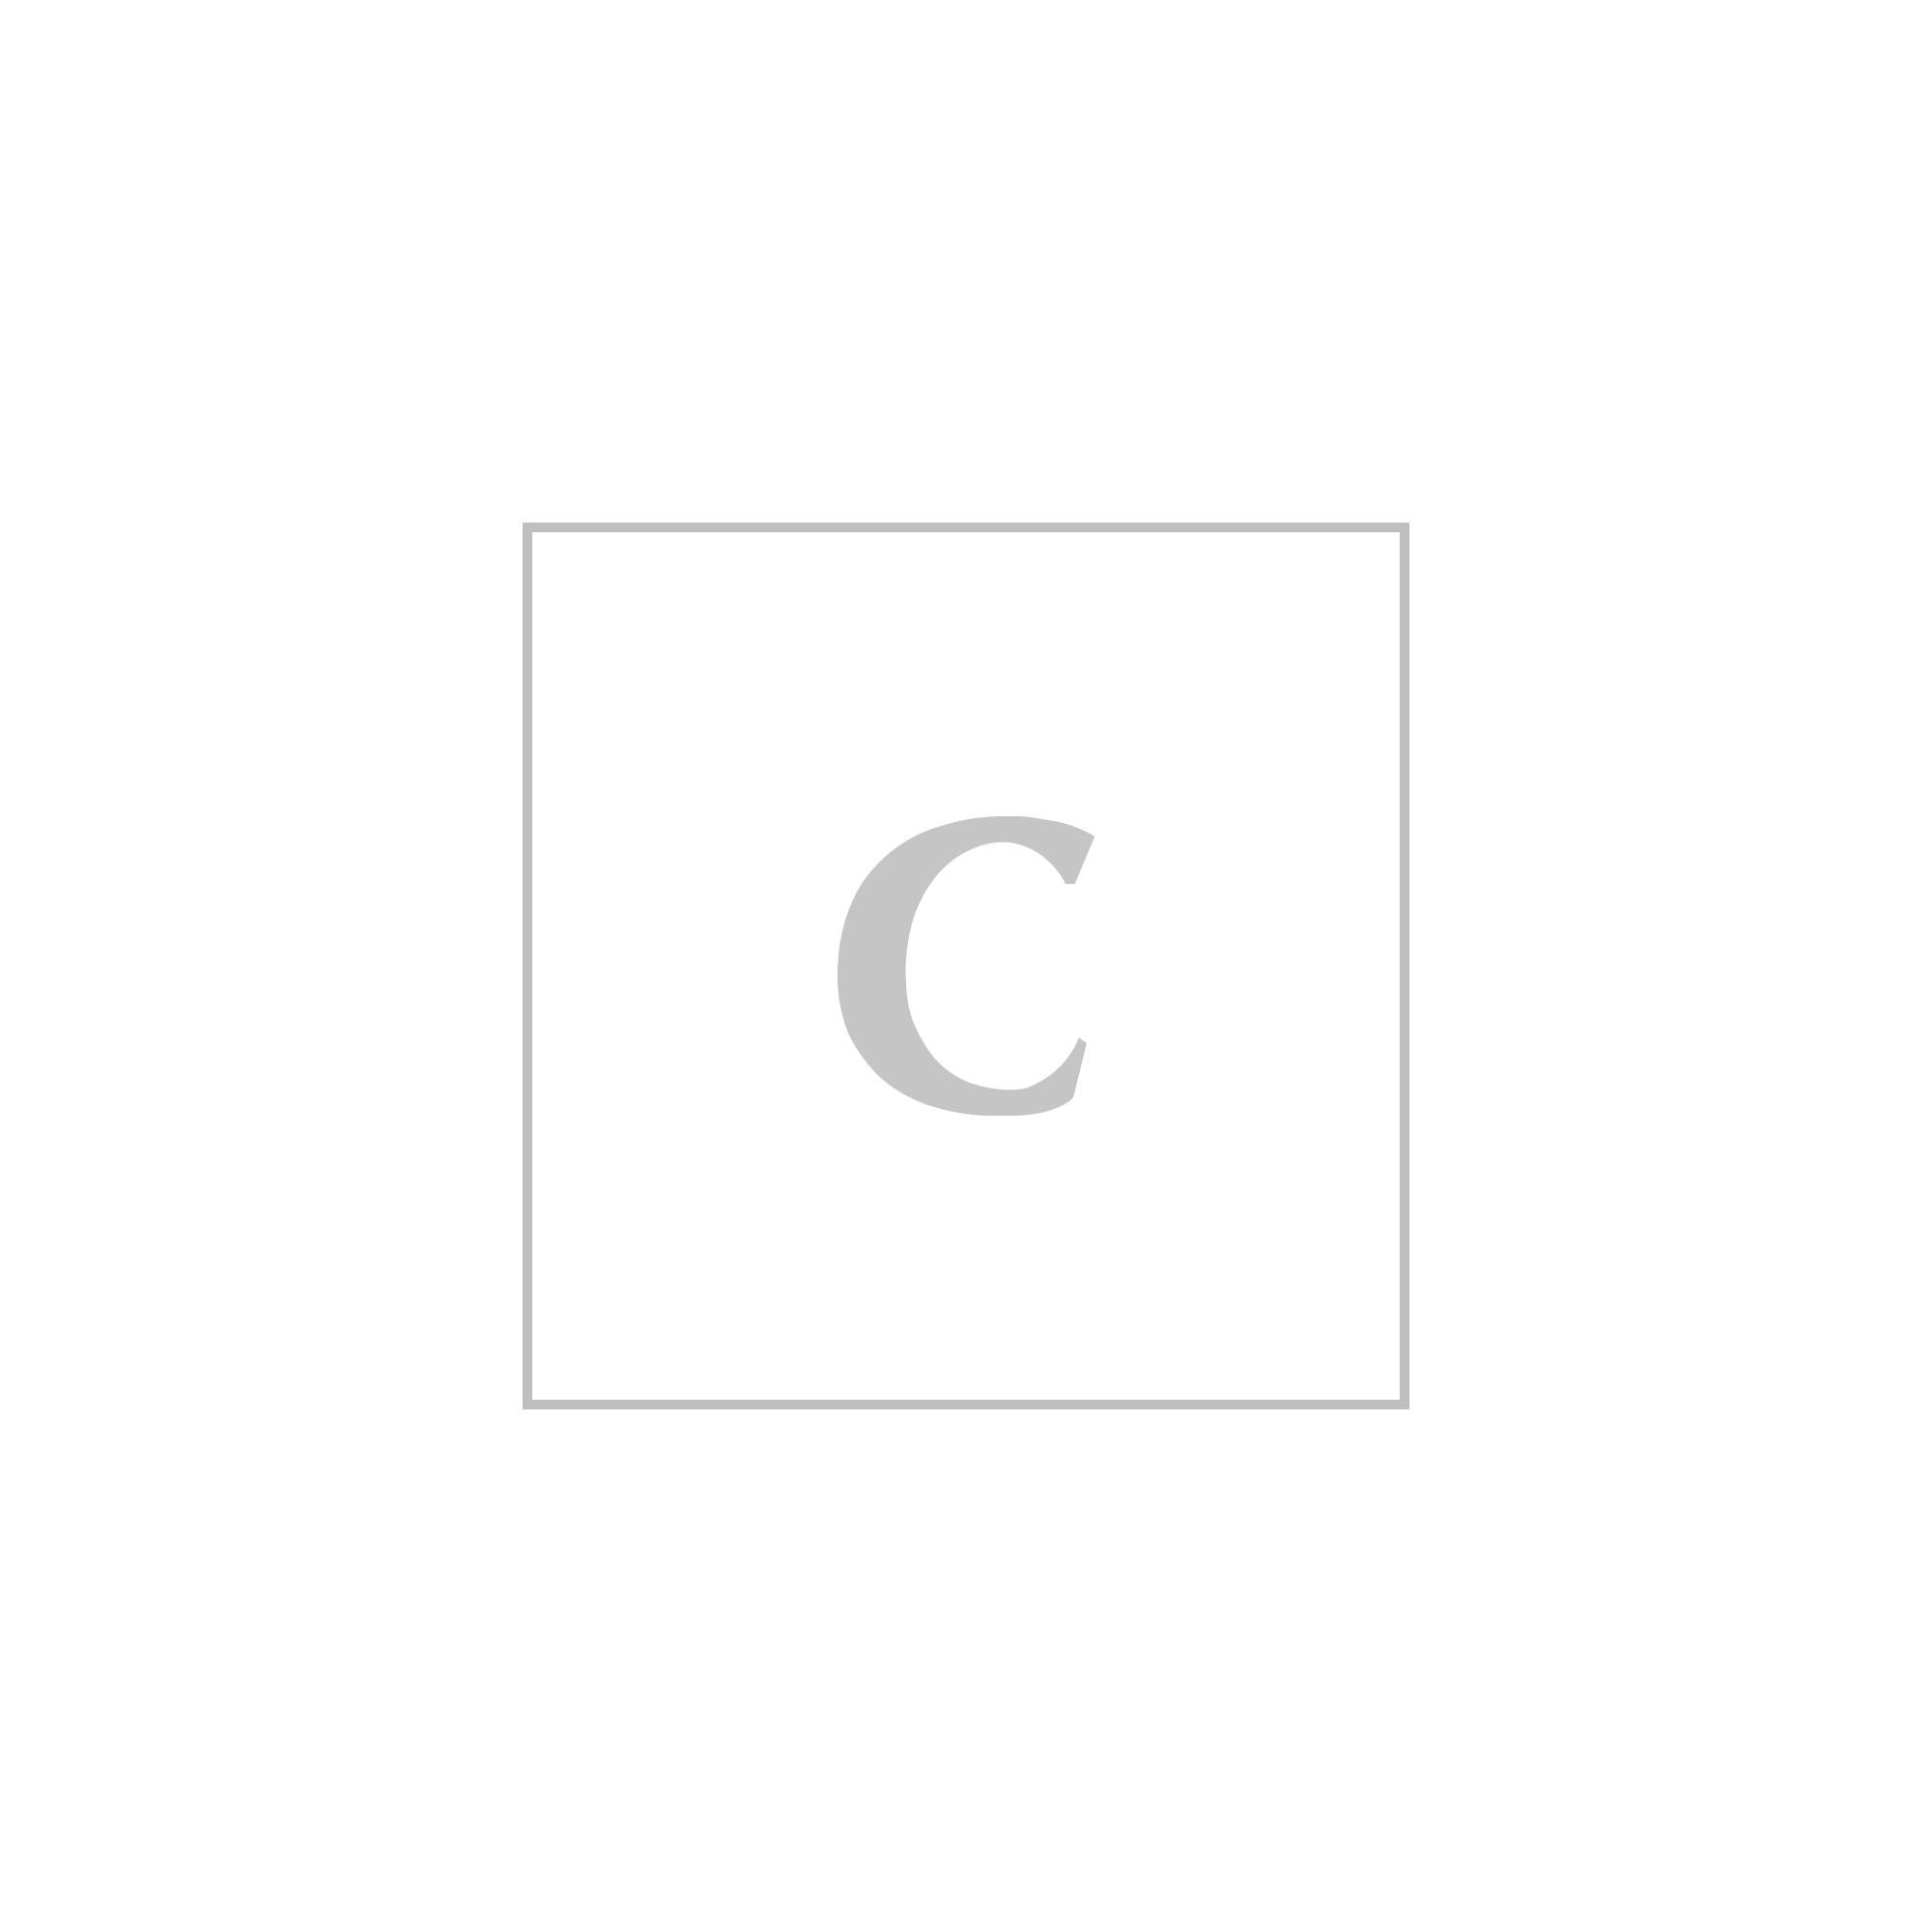 Saint laurent ysl cosmetic case monogramme